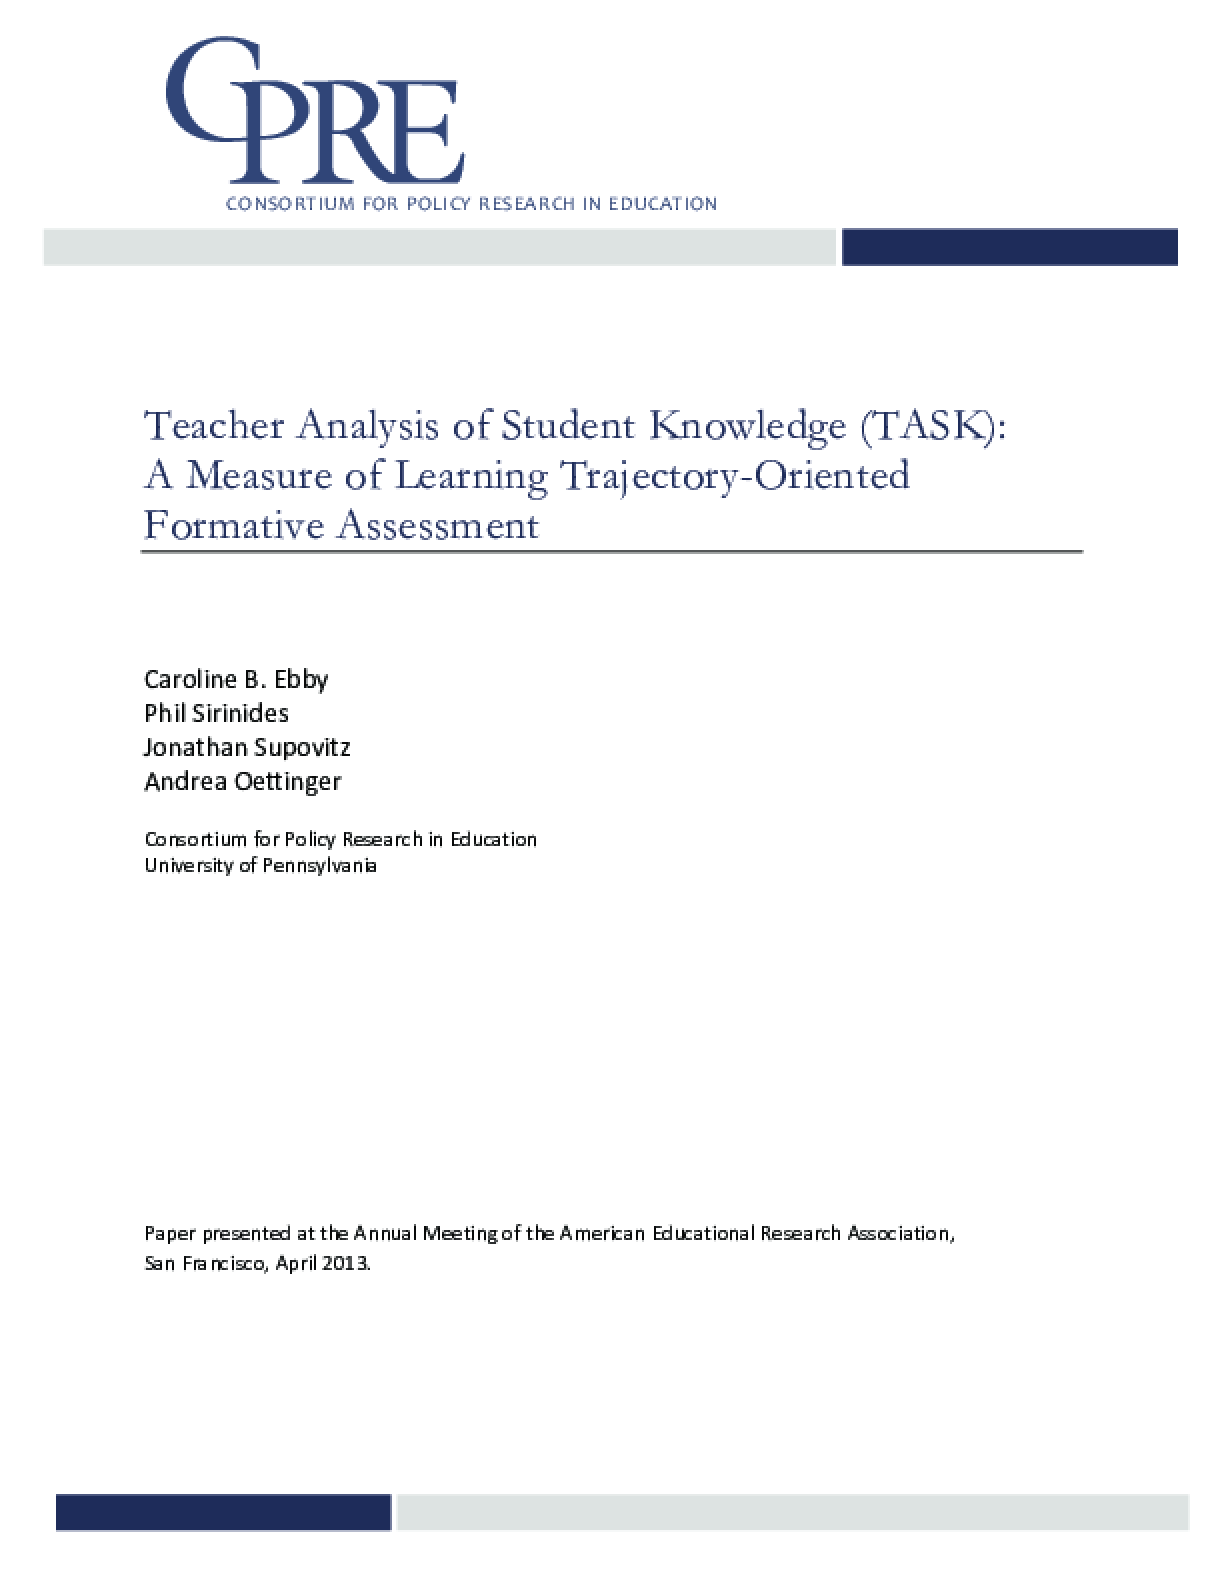 TASK Technical Report